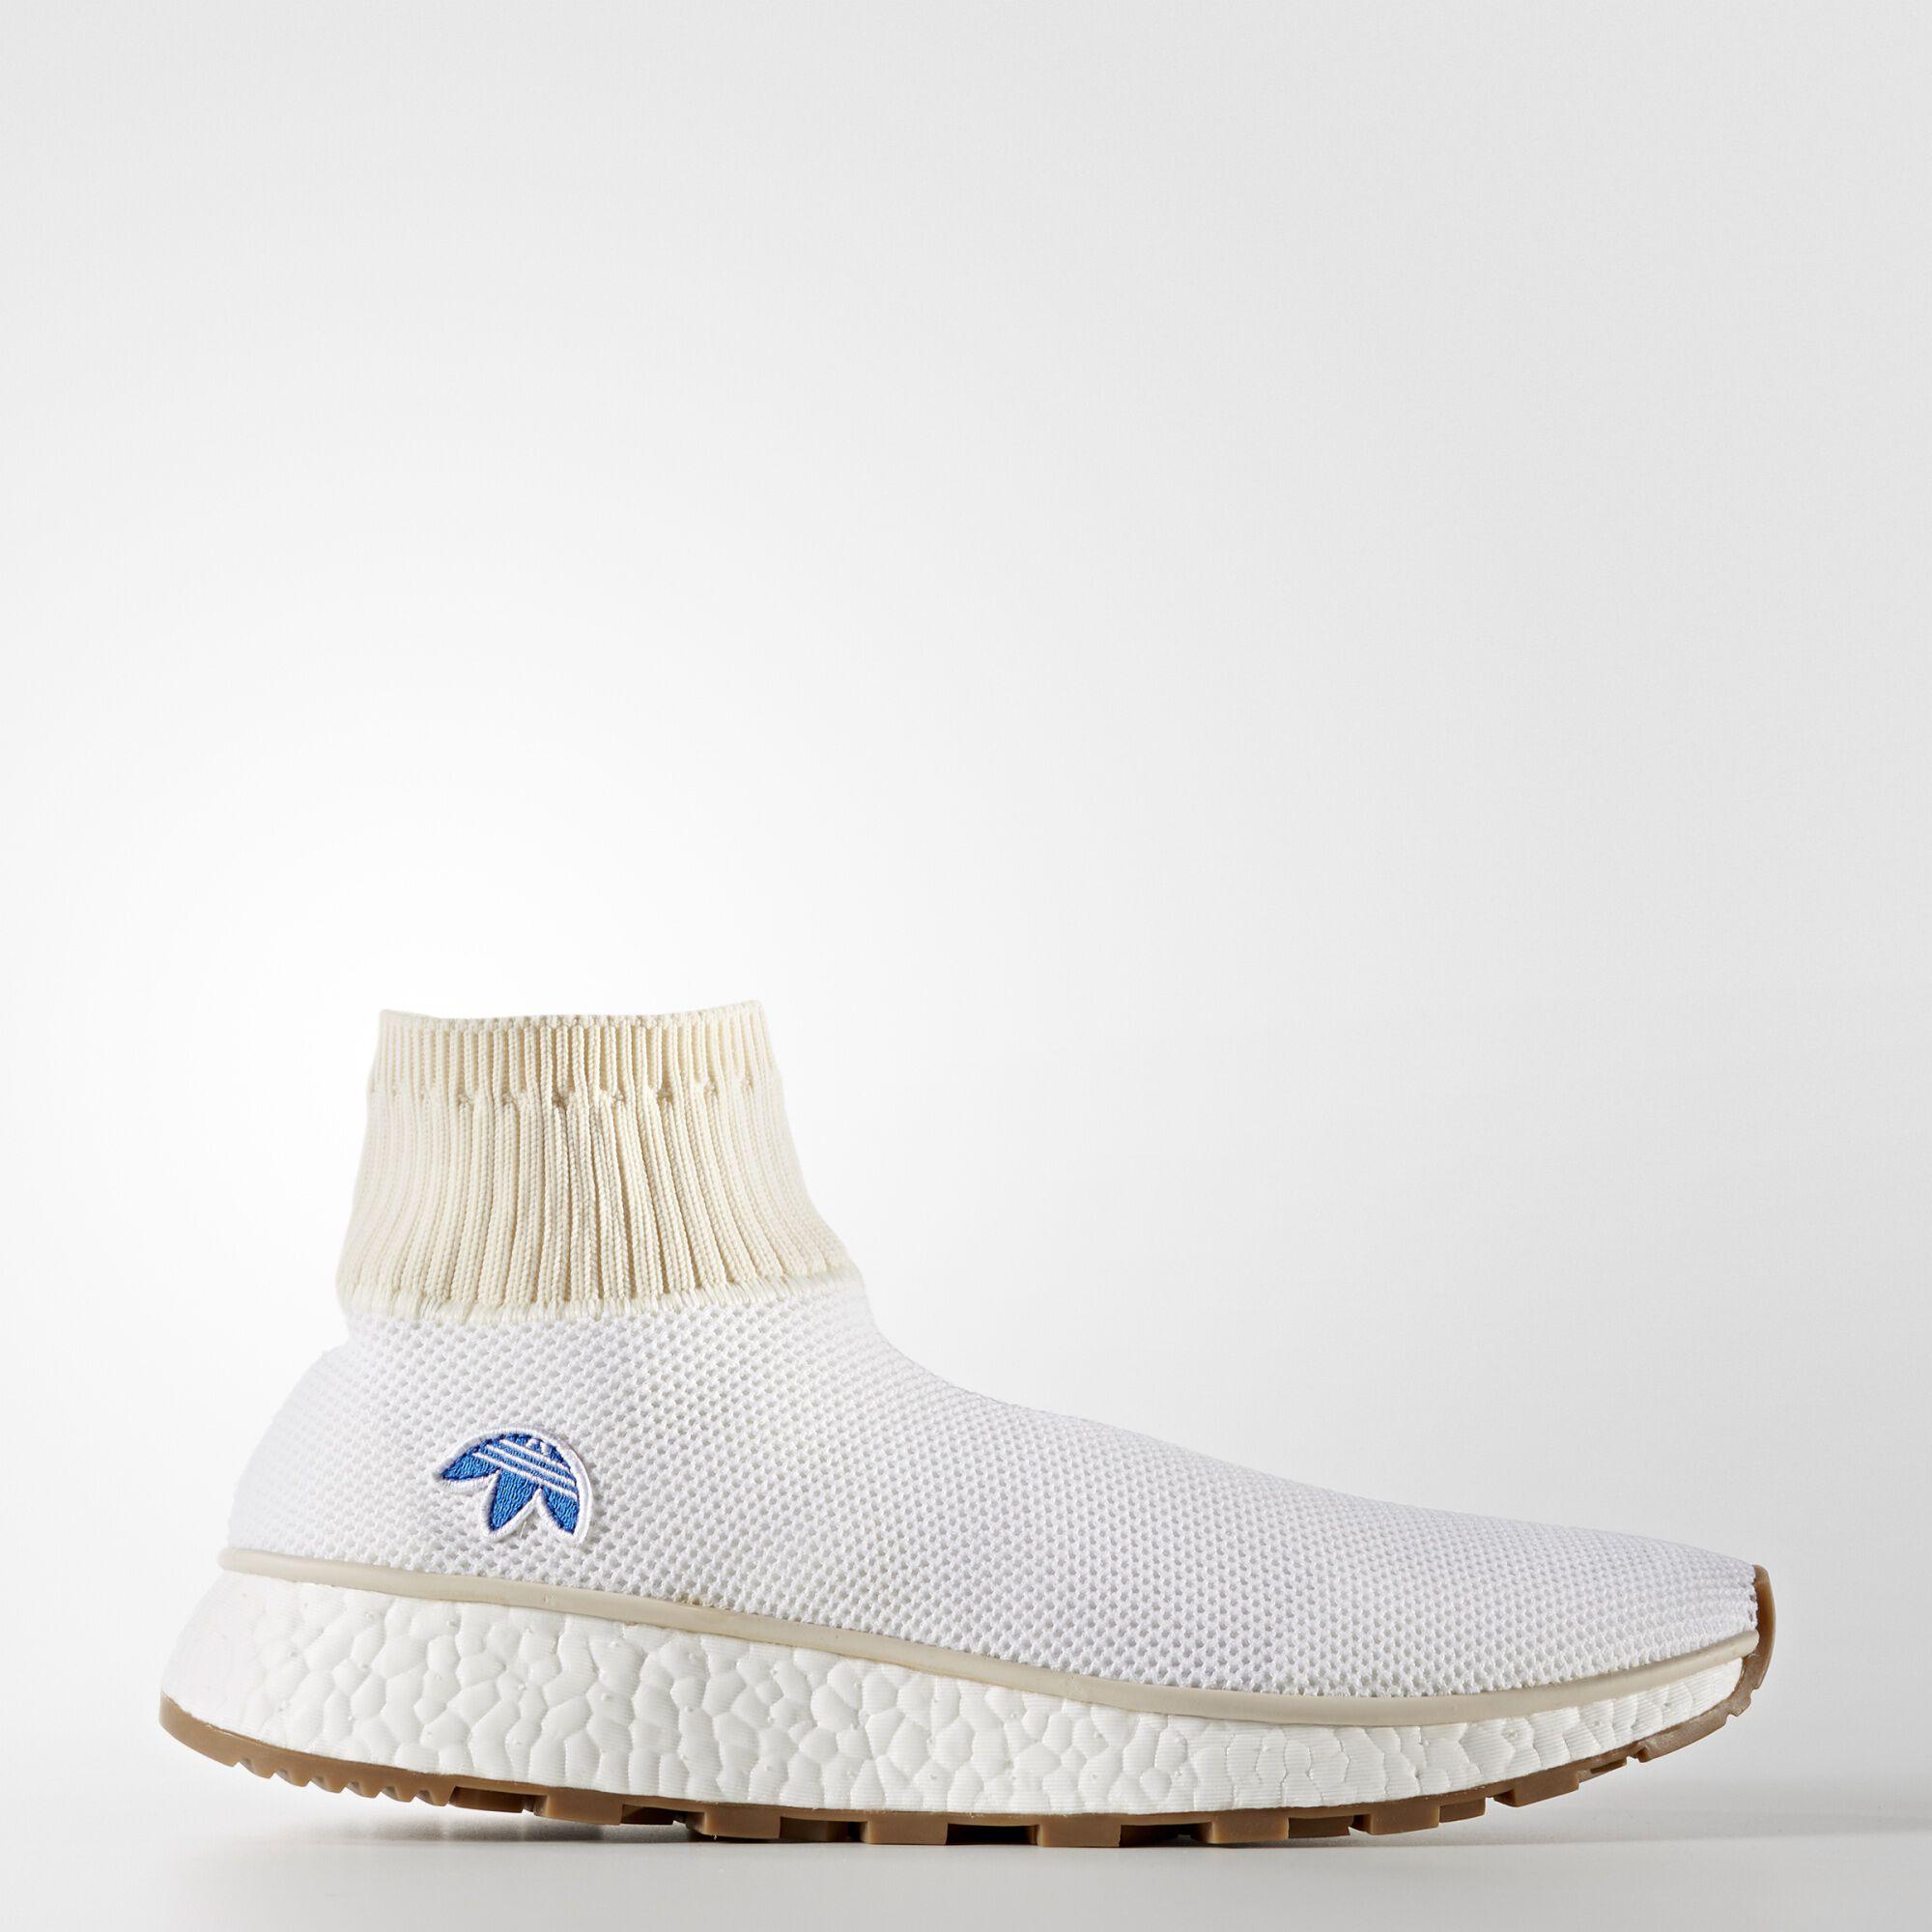 48c4e5ef878c59 ... wholesale dealer c8e27 c7ffb adidas Alexander Wang x AW Run Clean CW  Cream White White SKU ...